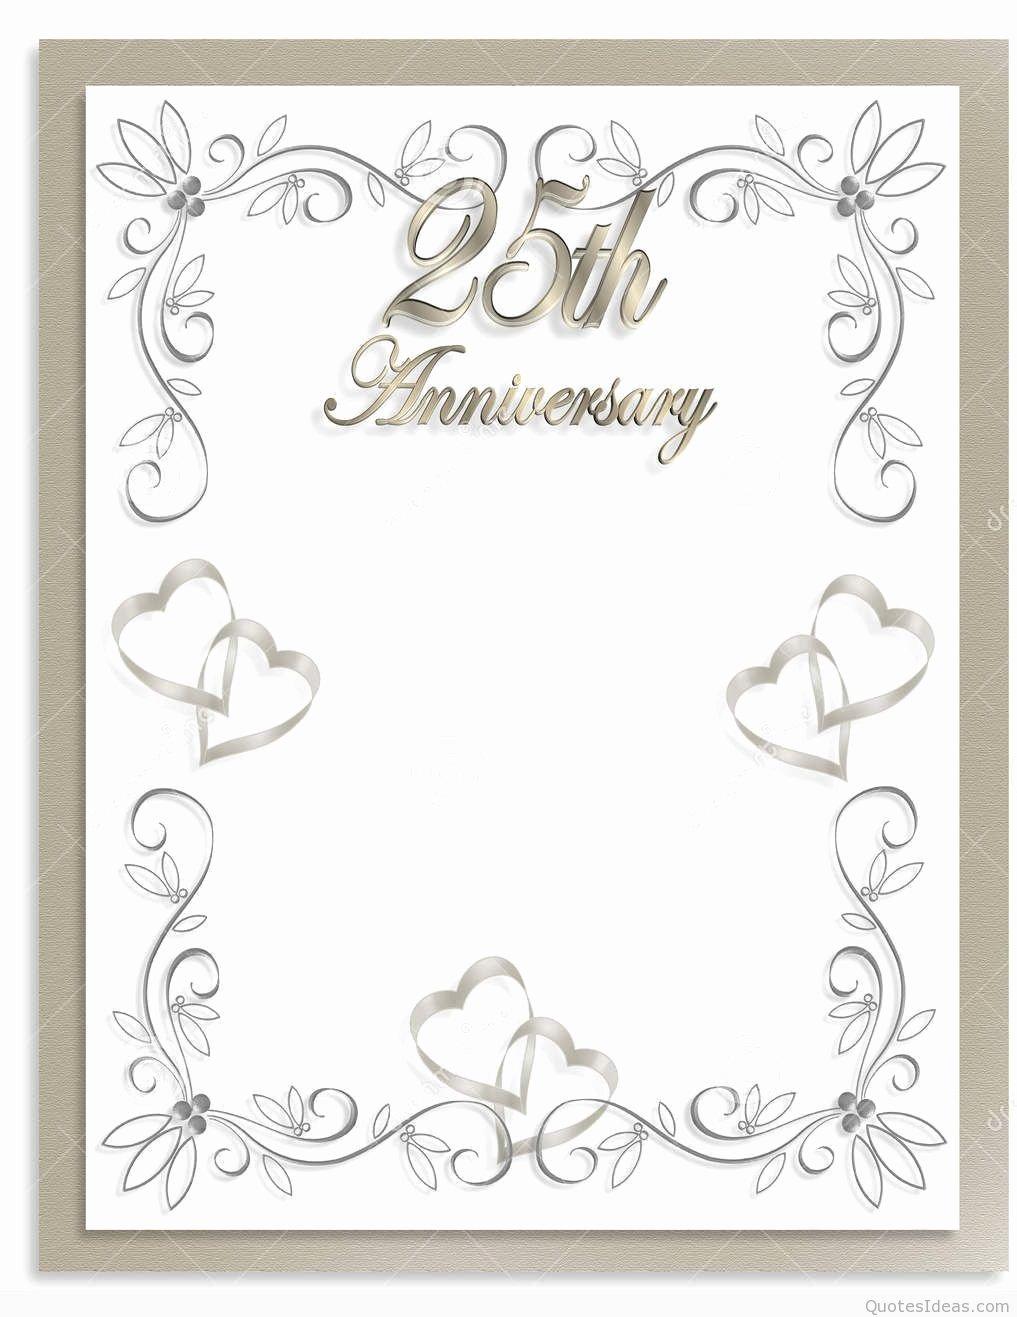 Wedding Anniversary Invitation Template Awesome Free 25th Wedding Anniversary Invitations Free Templates